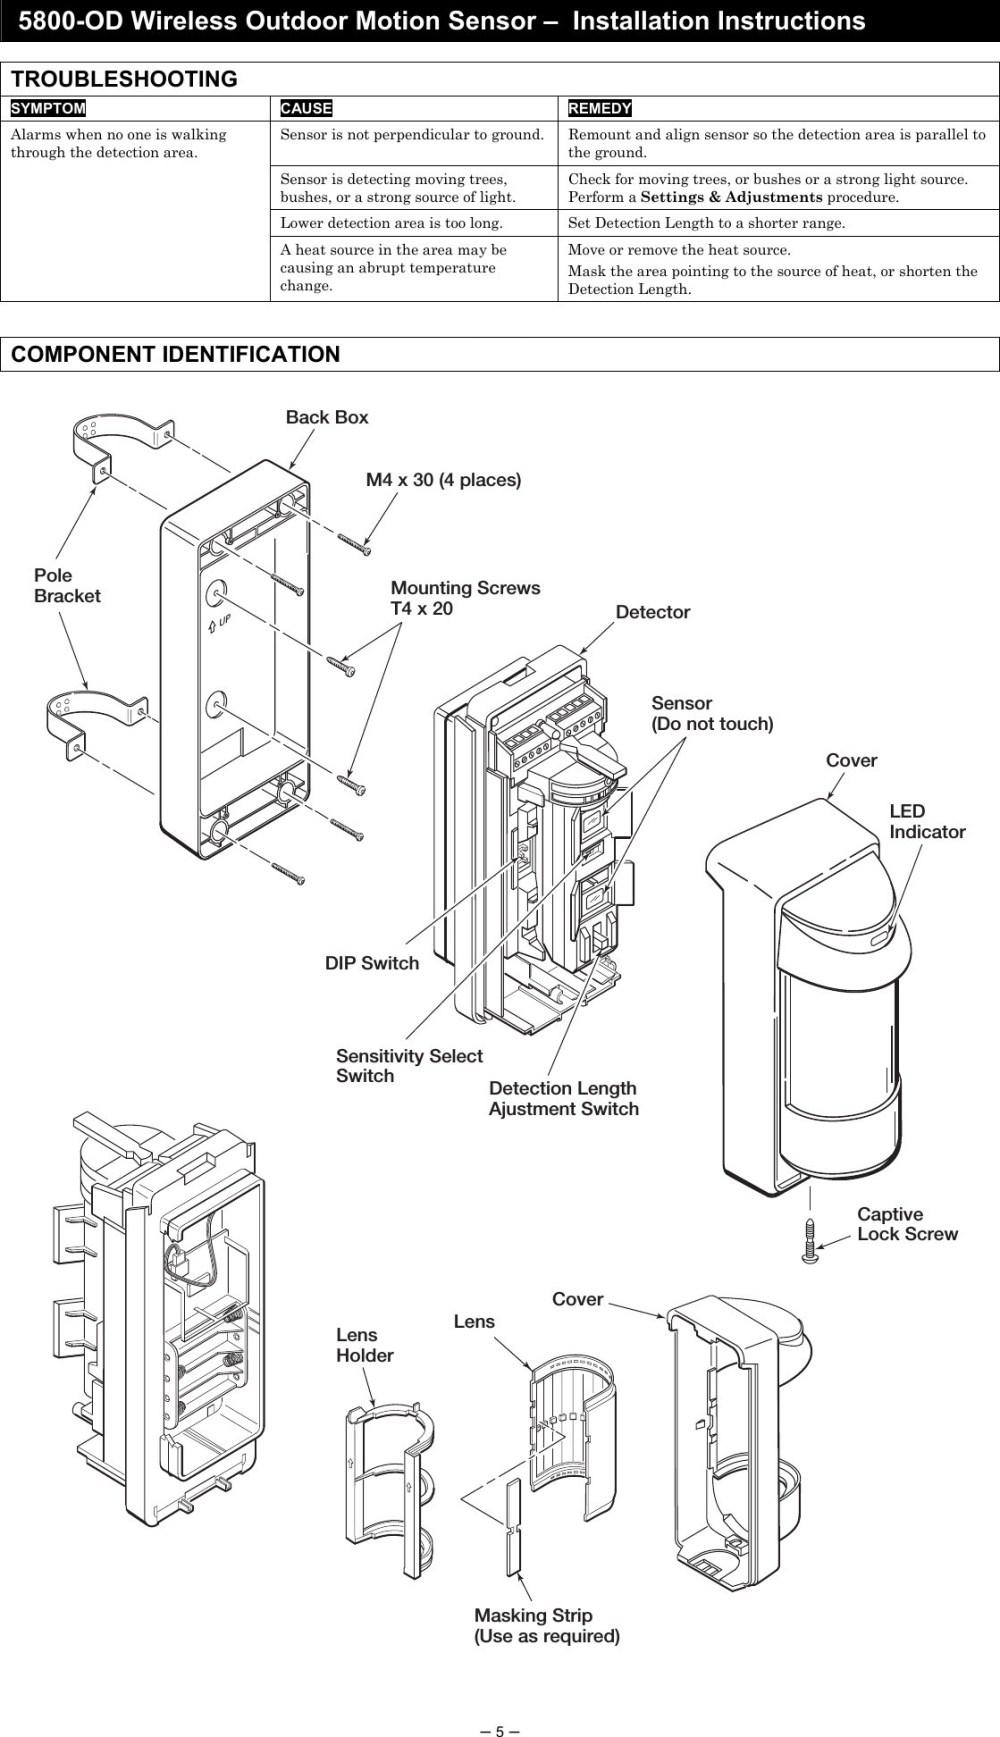 medium resolution of lp jr wiring diagram free wiring diagramlp jr wiring diagram gibson les paul deluxe wiring diagram